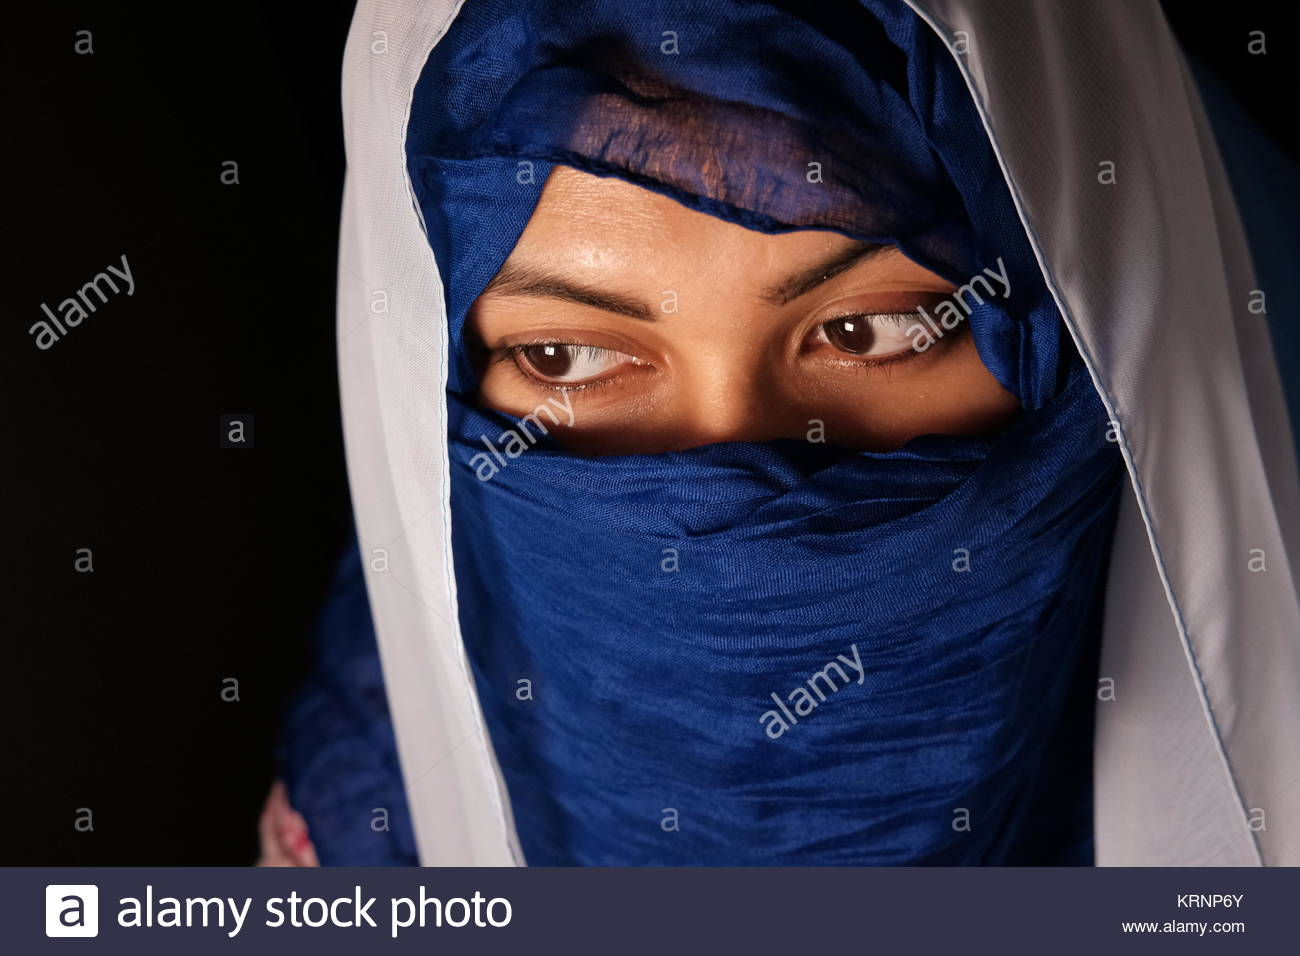 nude arb muslim girl